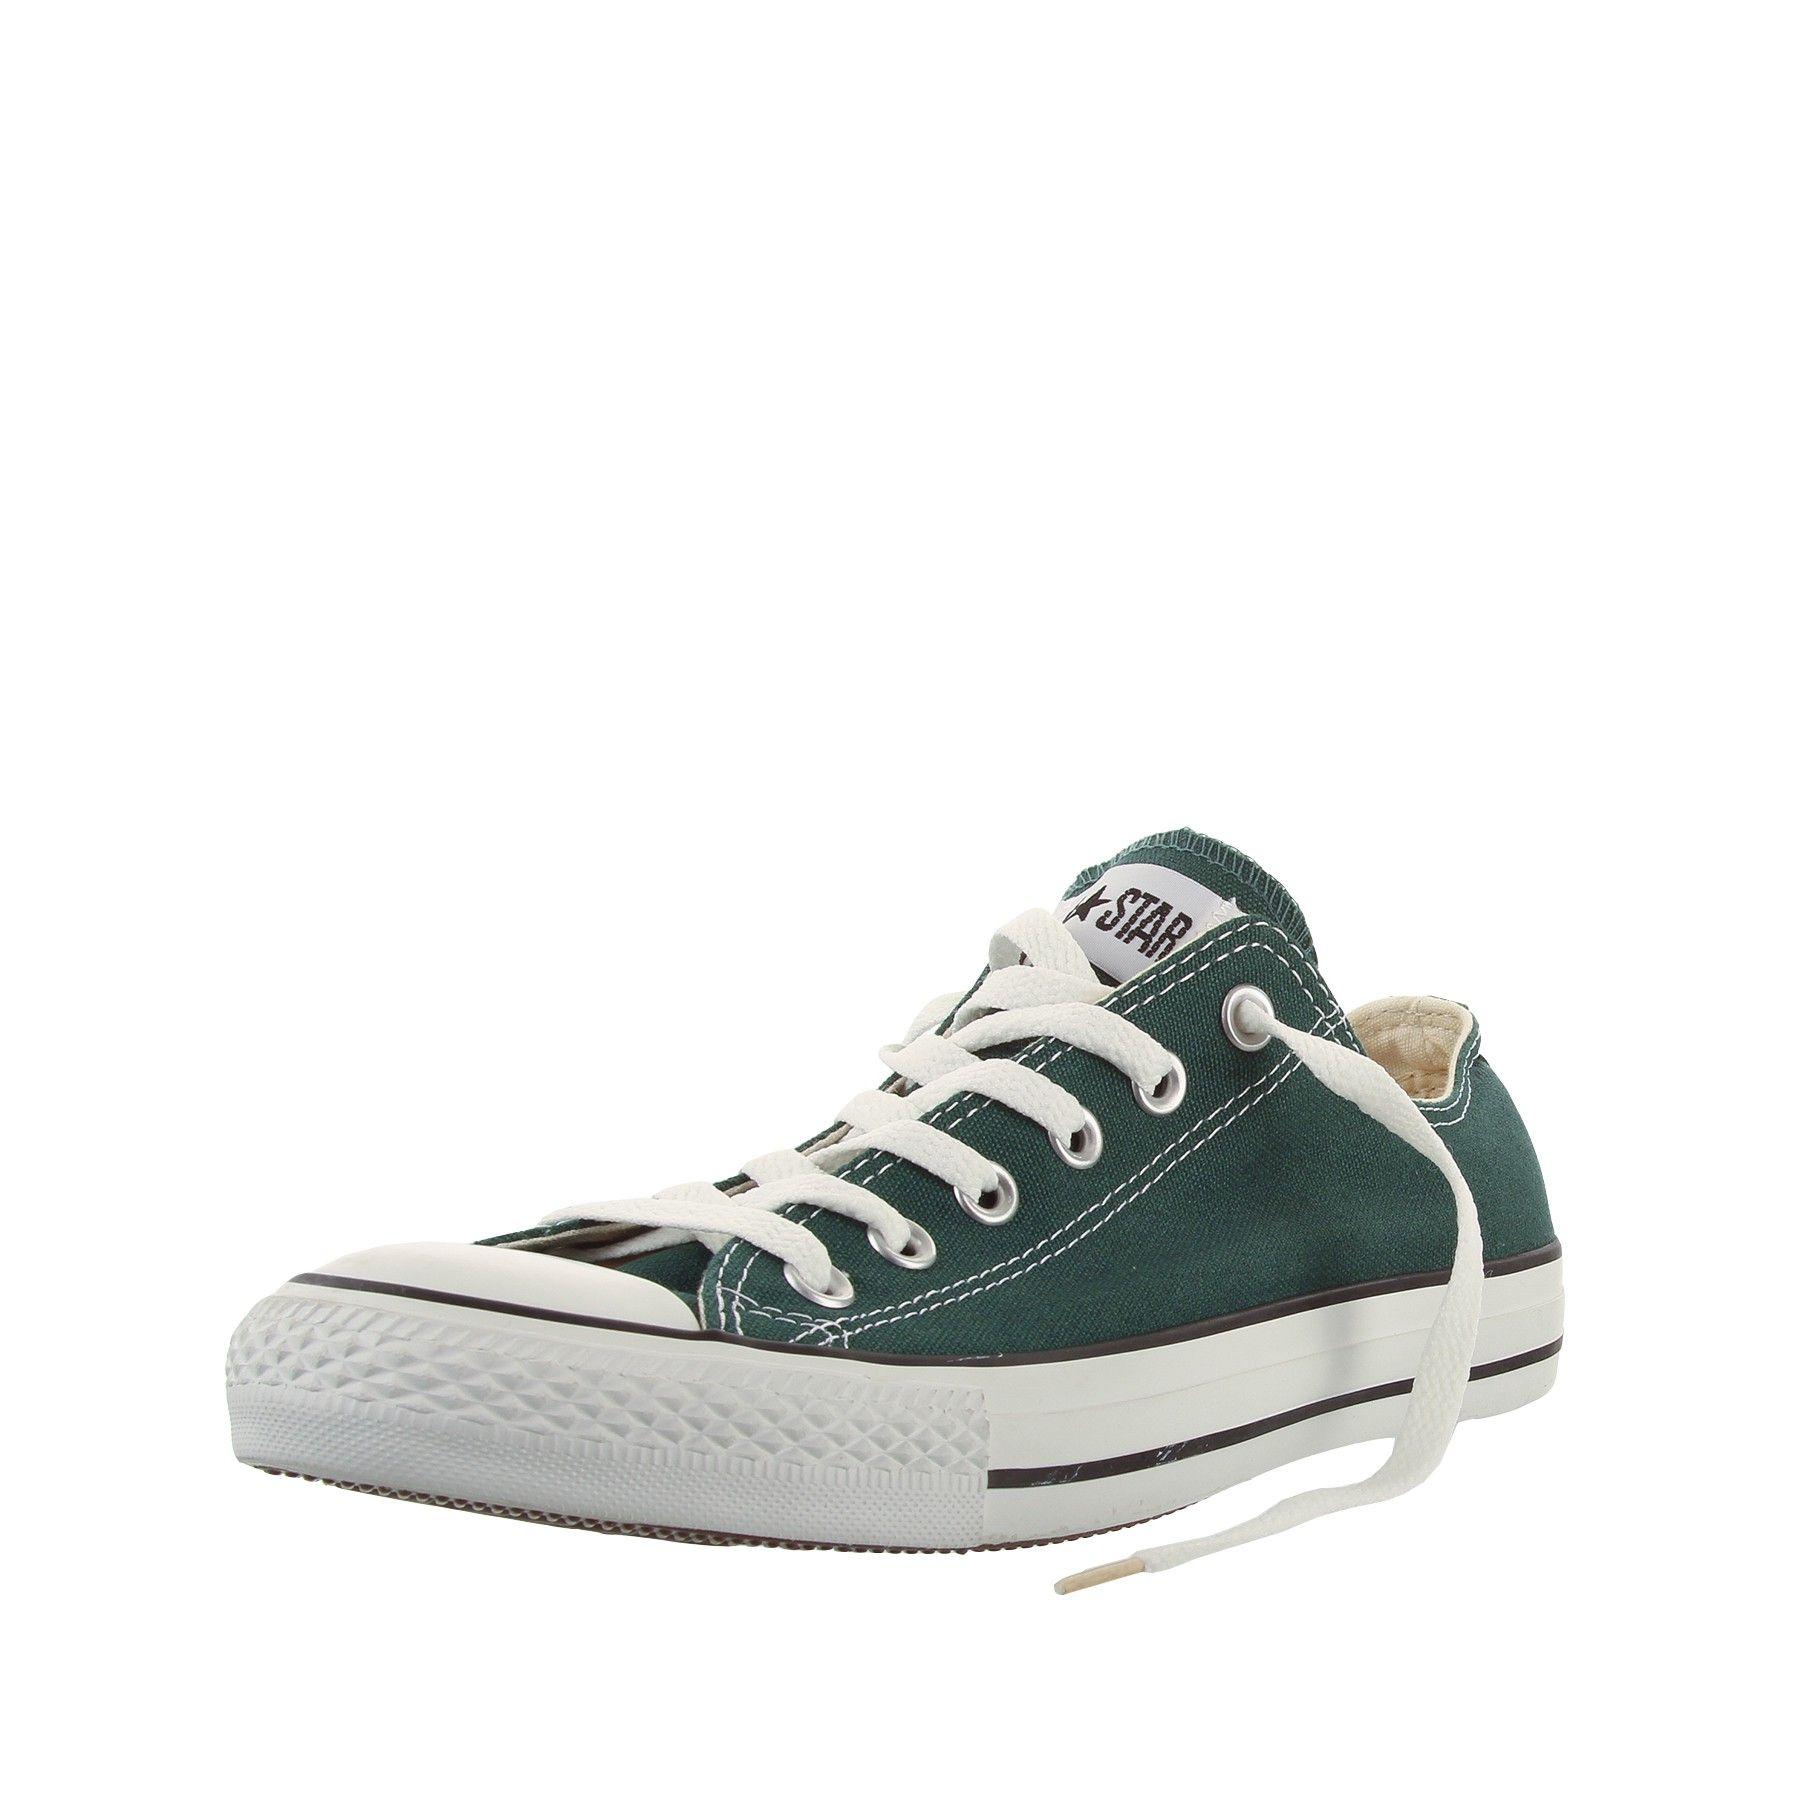 M4434 CT CHUCK TAYLOR ALL STAR OXPINE GREEN Schuhe Herren